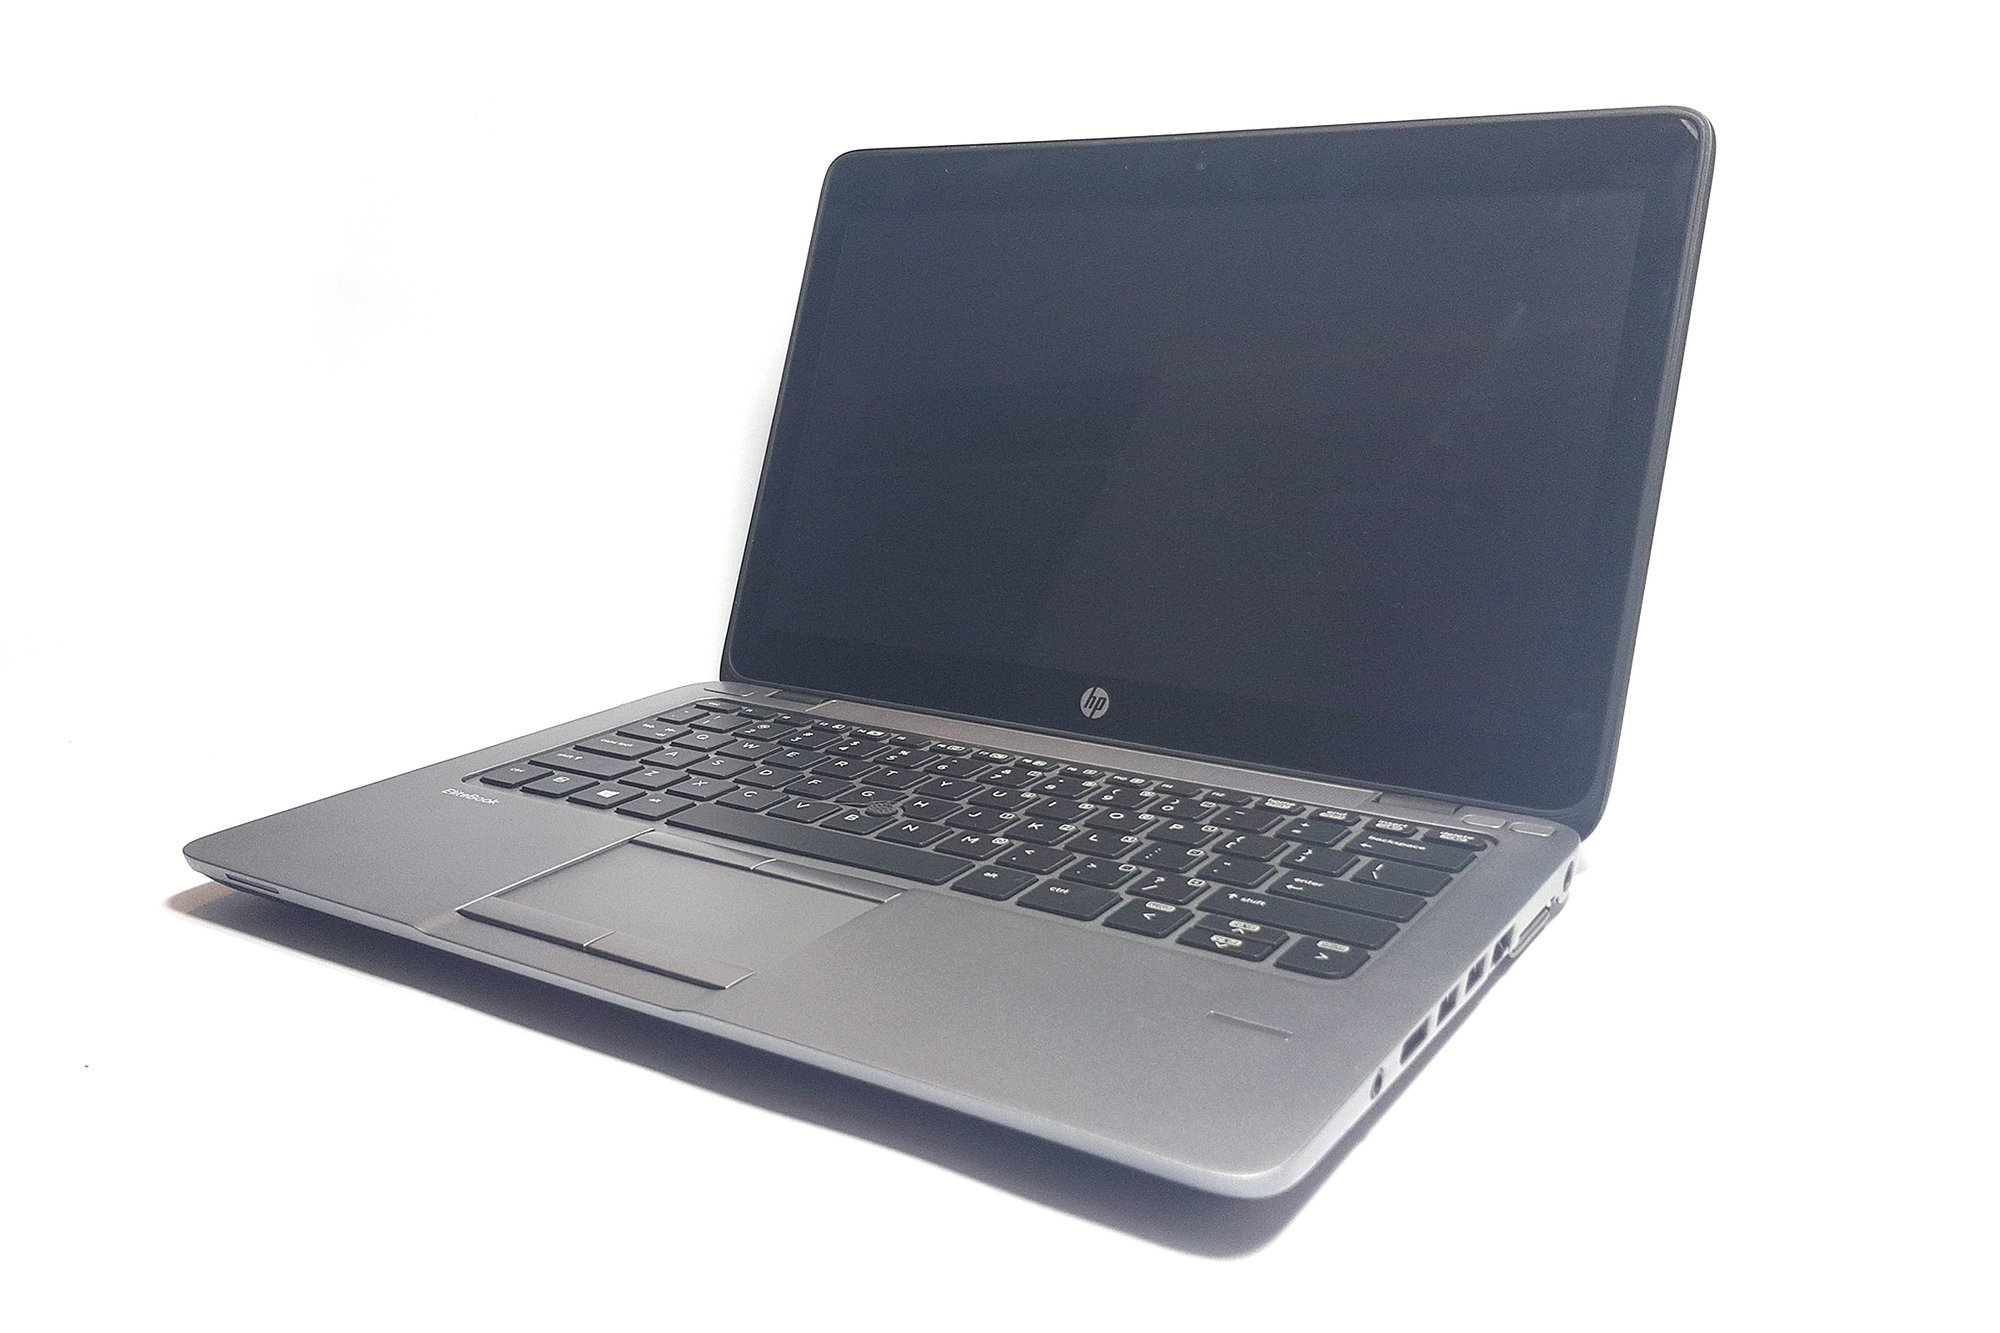 Notebook HP EliteBook 820 G2 i3-5010U 4GB 500GB